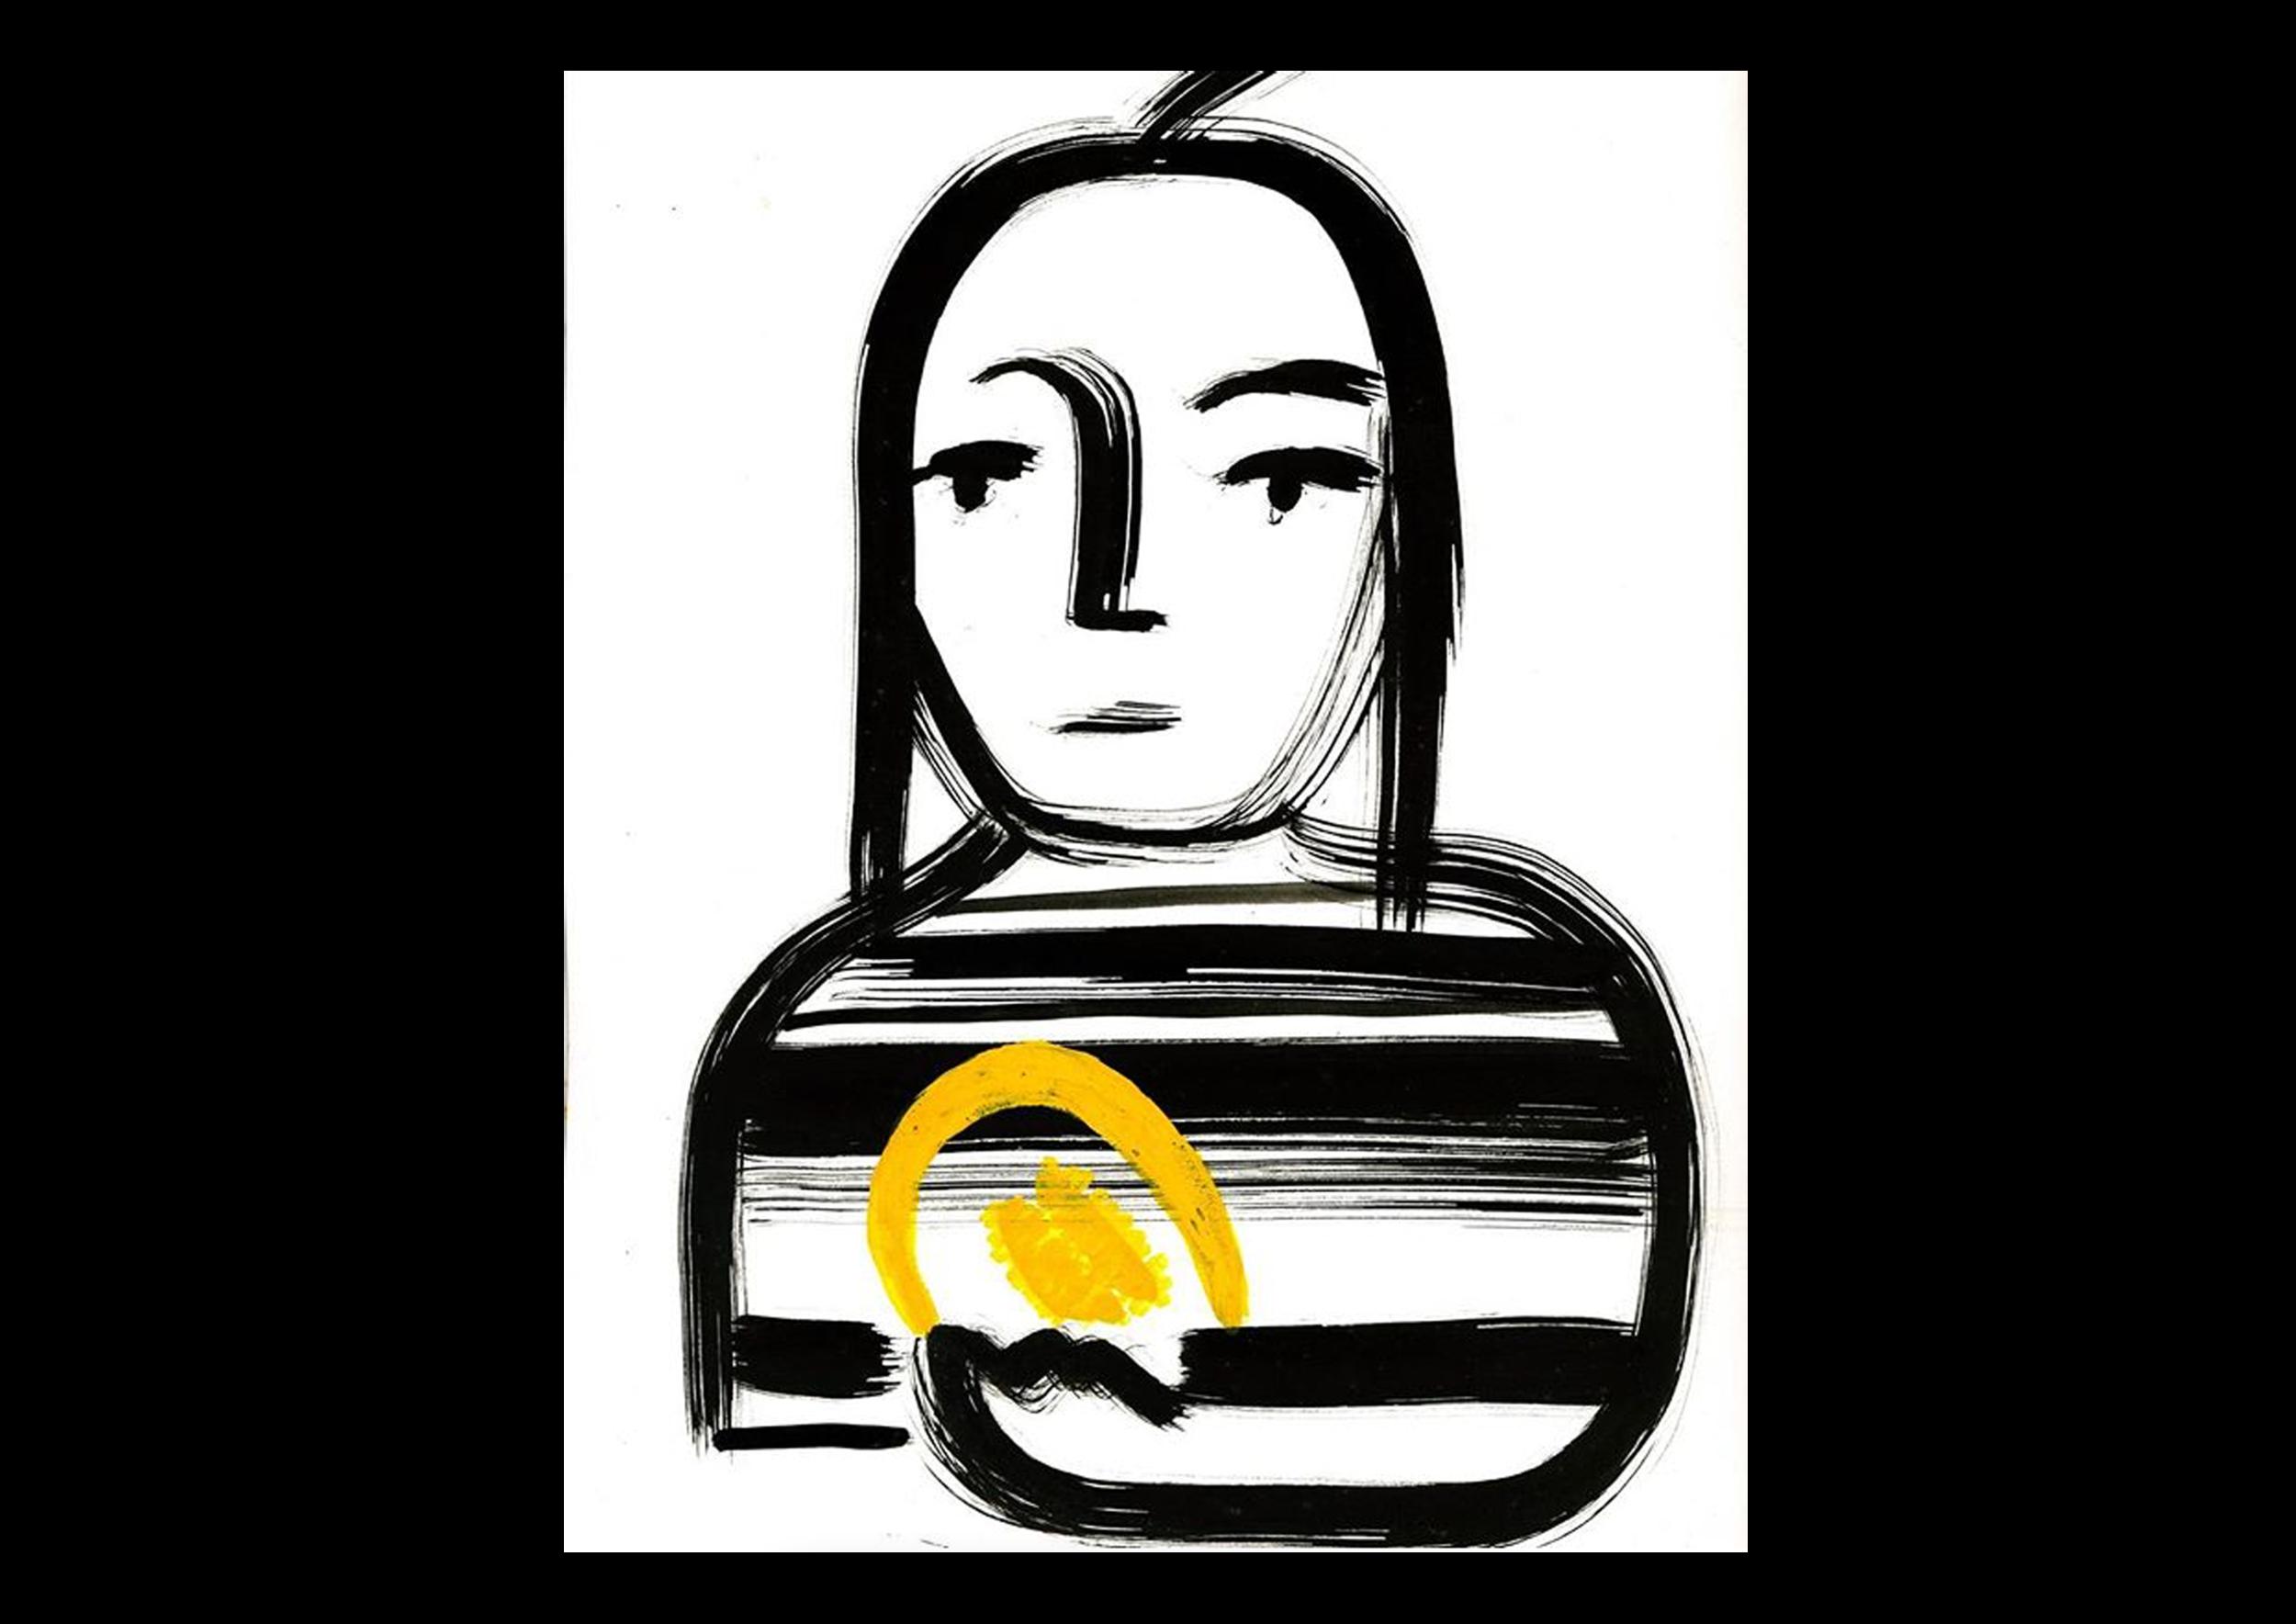 portrait illustration by julia Aumann  NO BAD THOUGHT 'MONA WITH MELON'